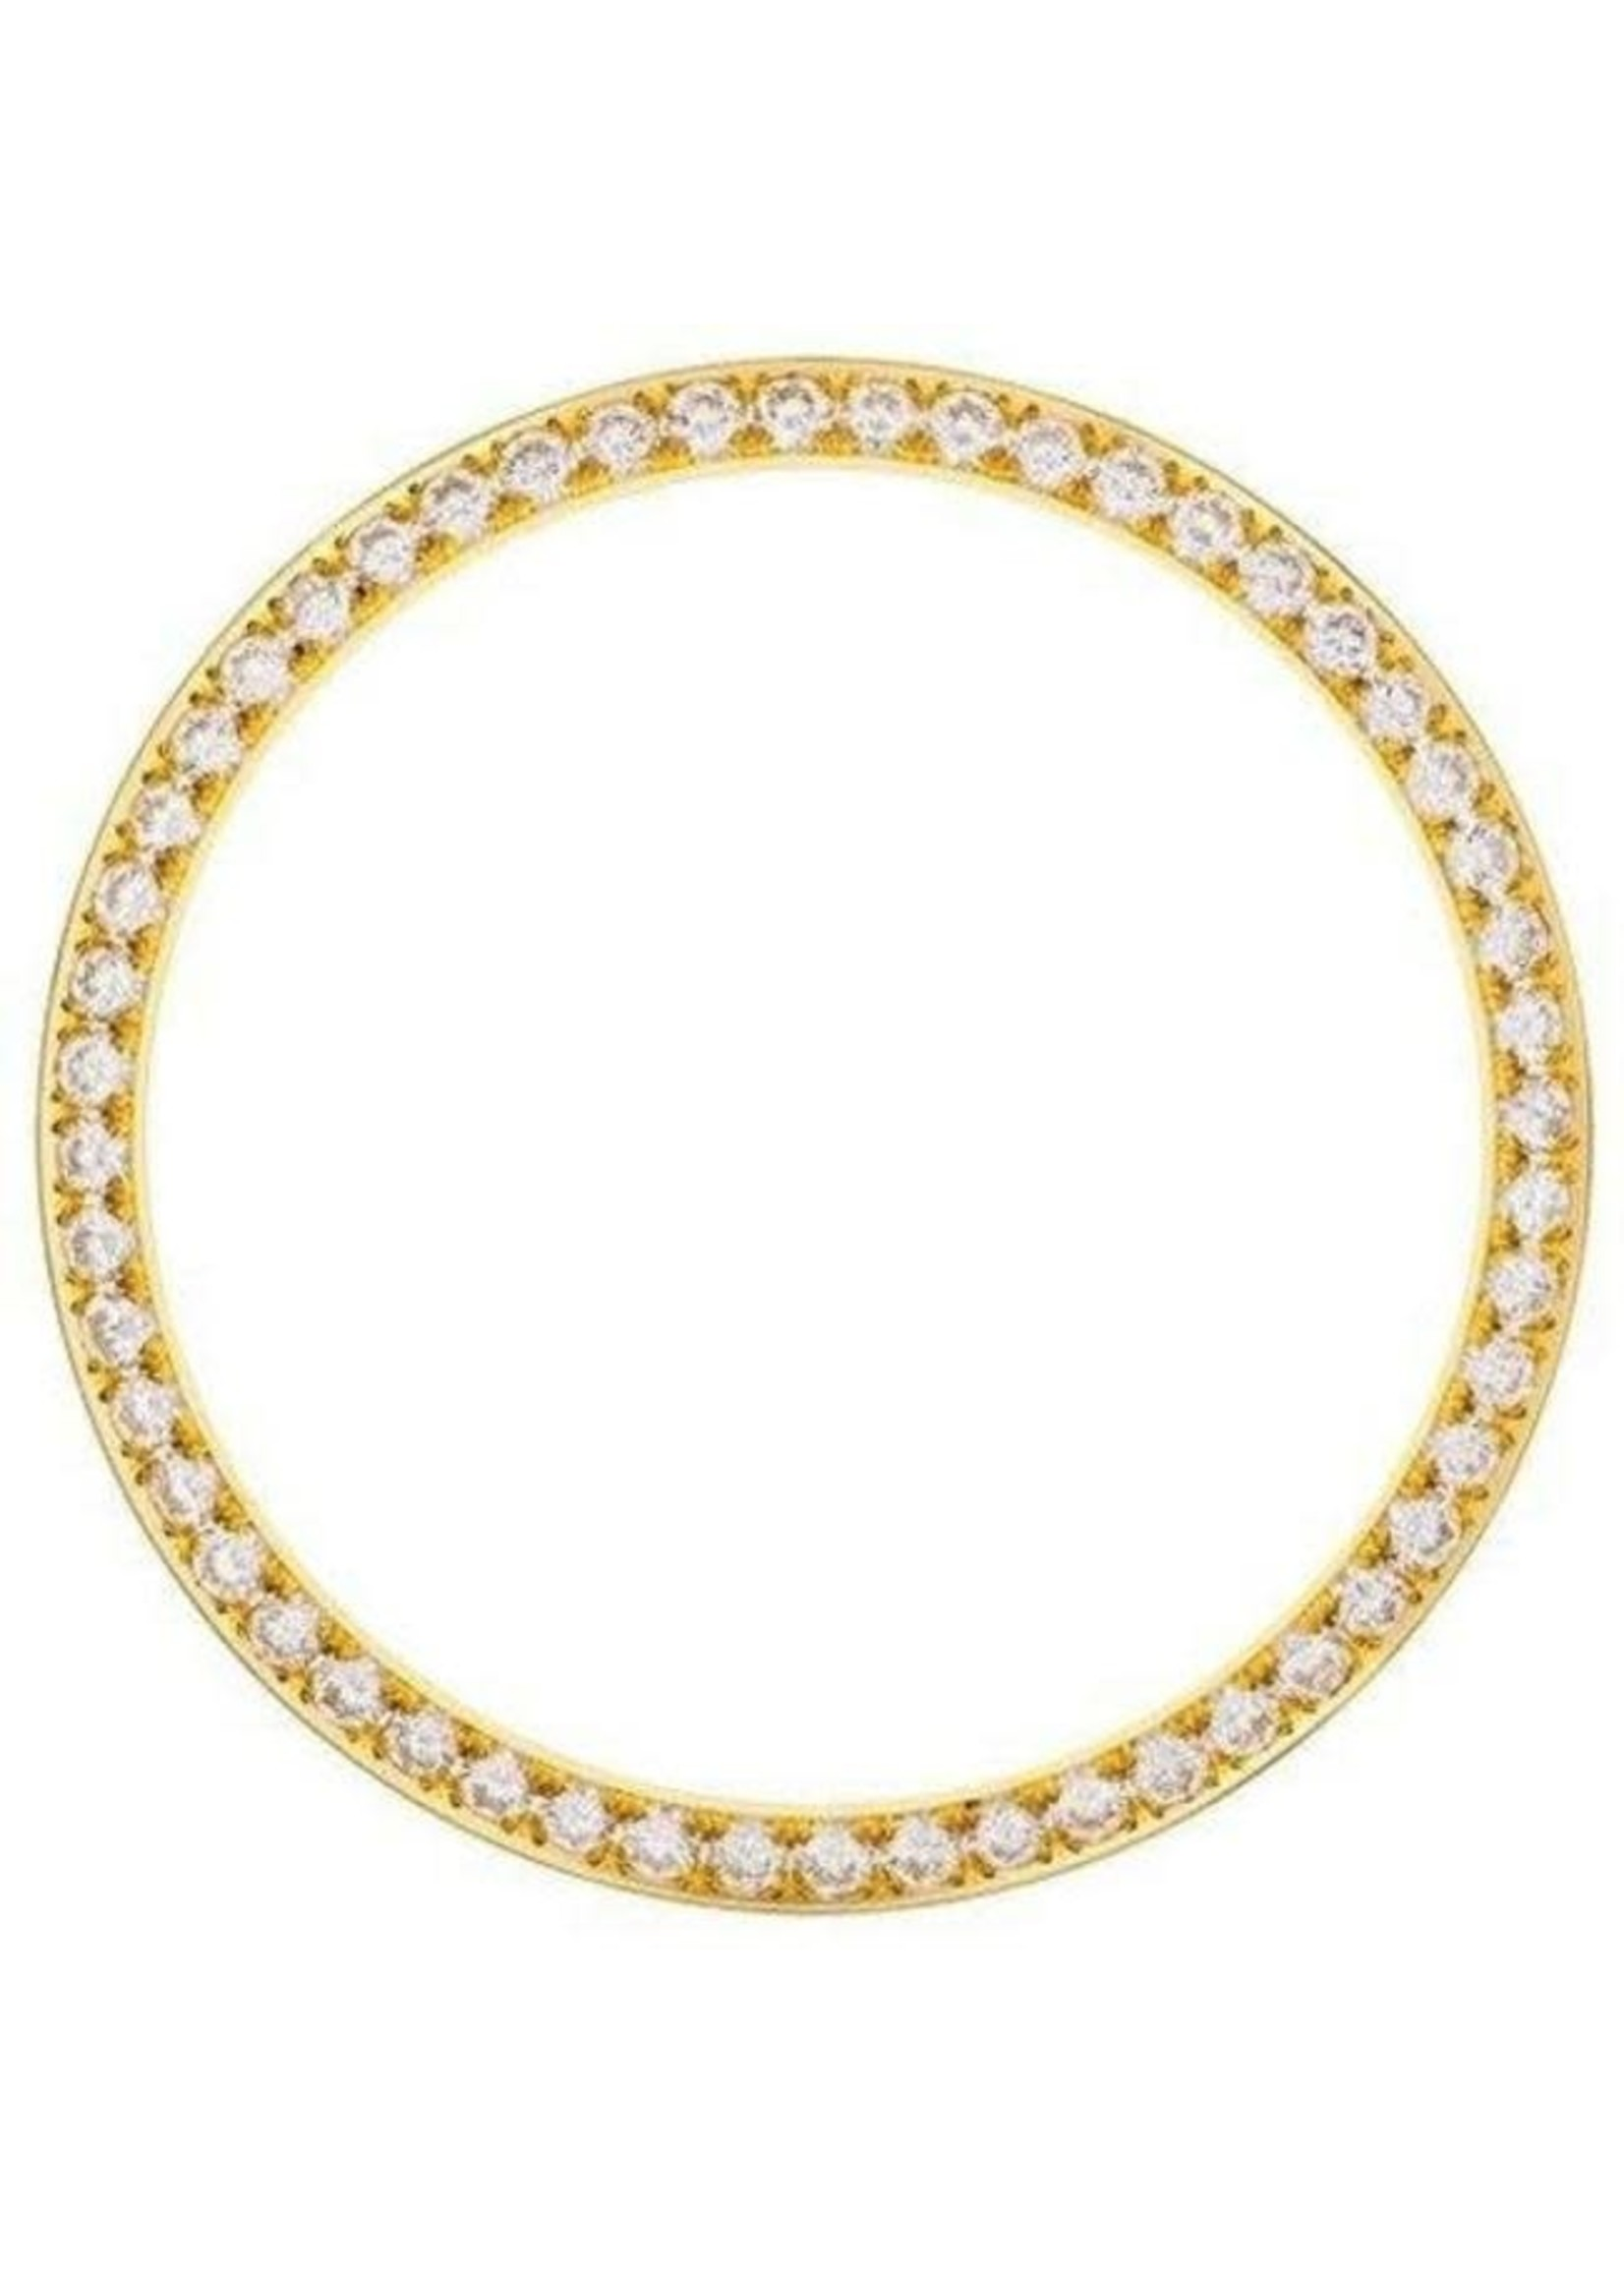 DIAMOND BEZEL 26MM YELLOW GOLD